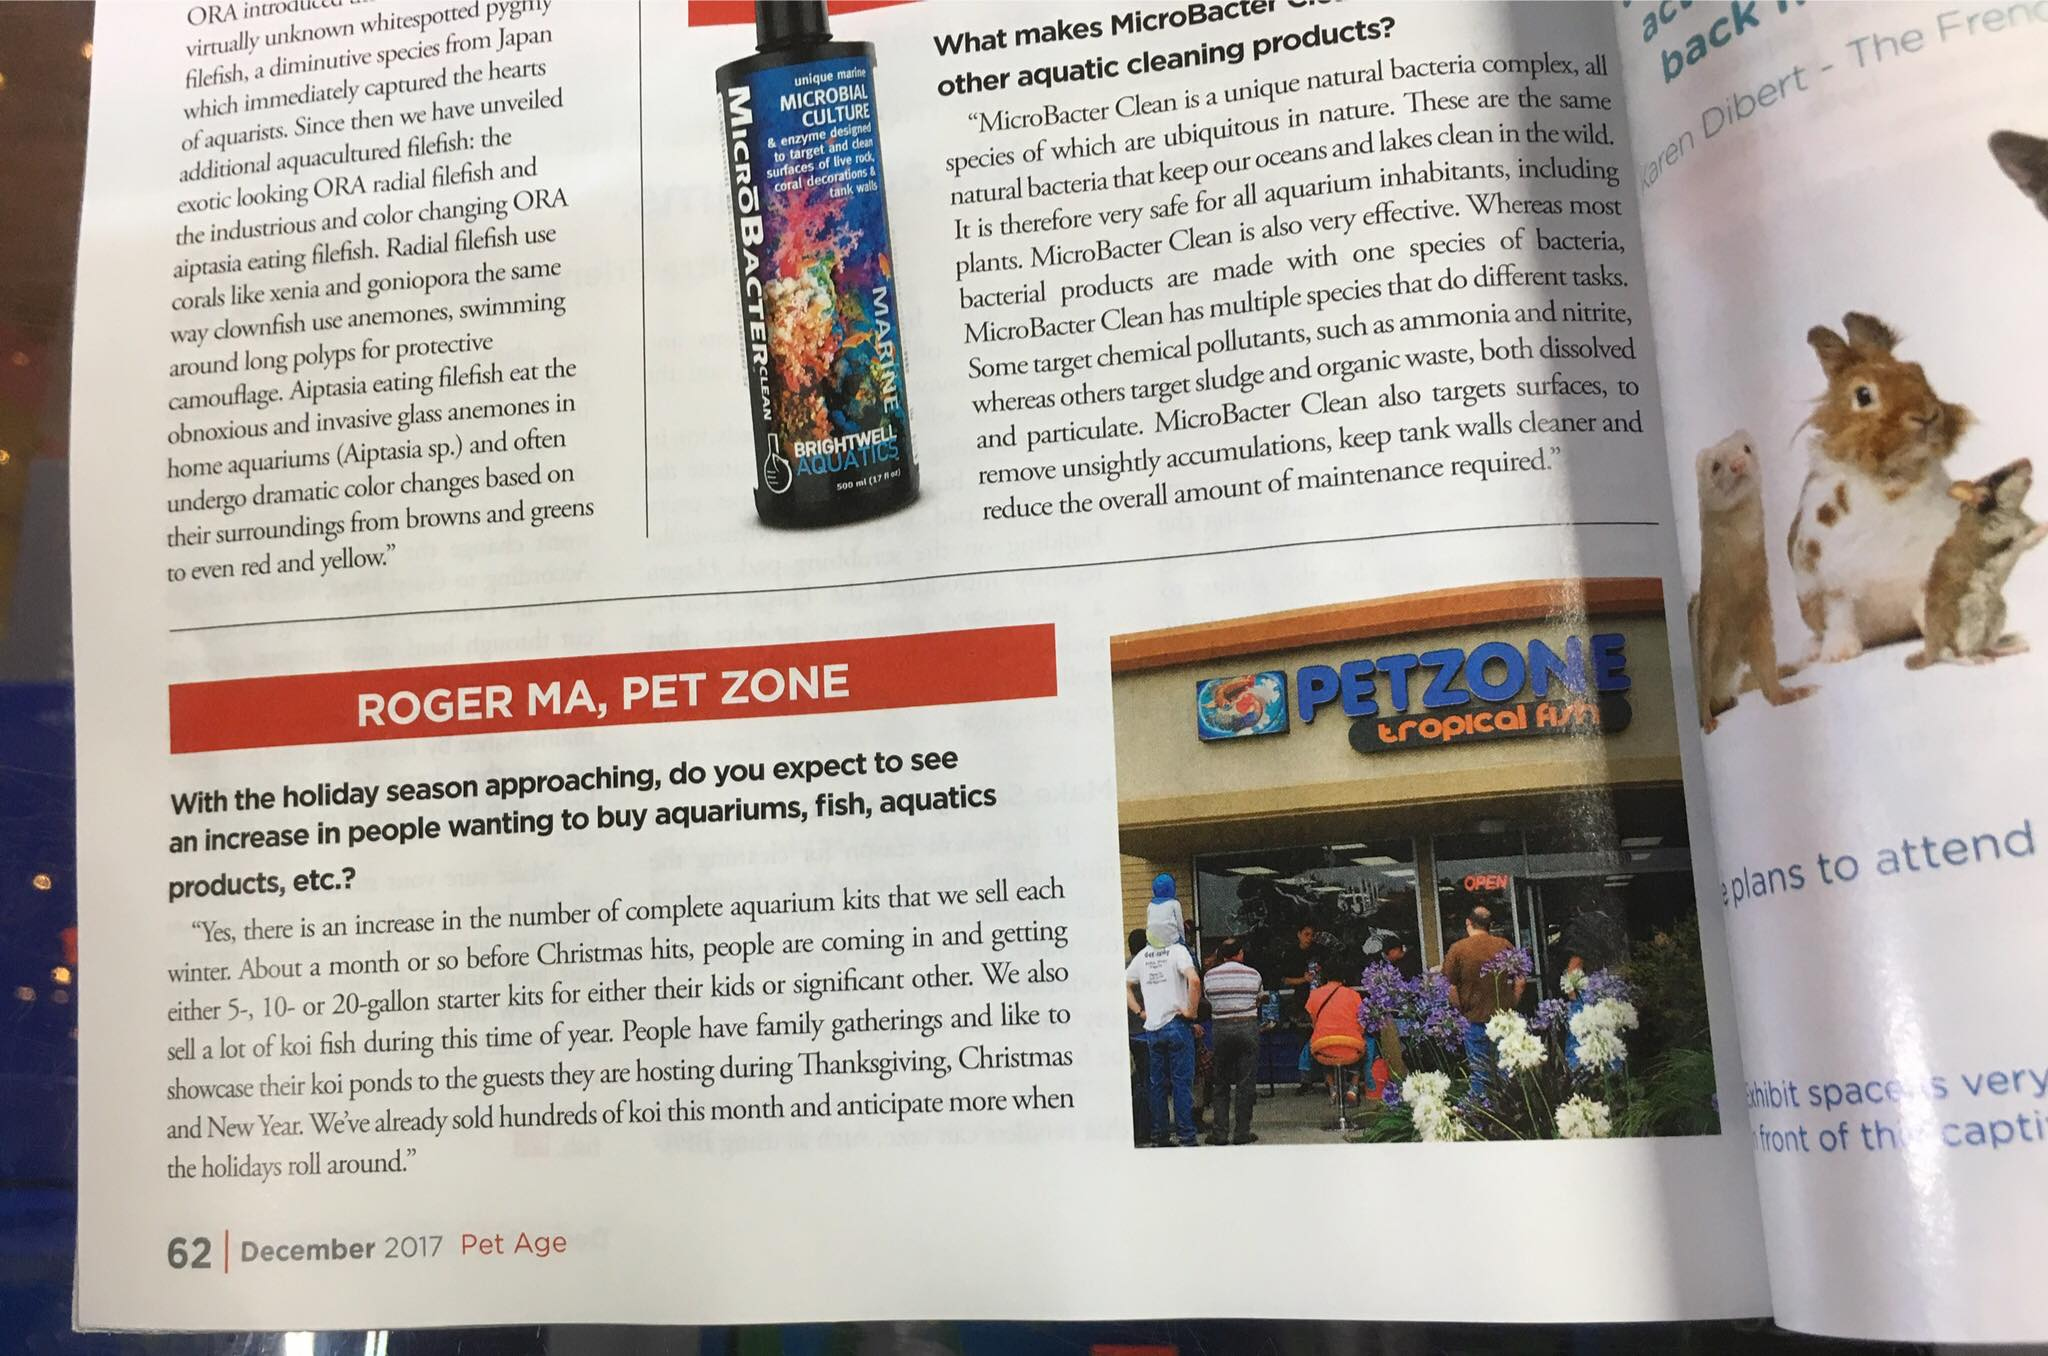 pet-age-magazine-pet-zone-tropical-fish-roger-ma.jpg